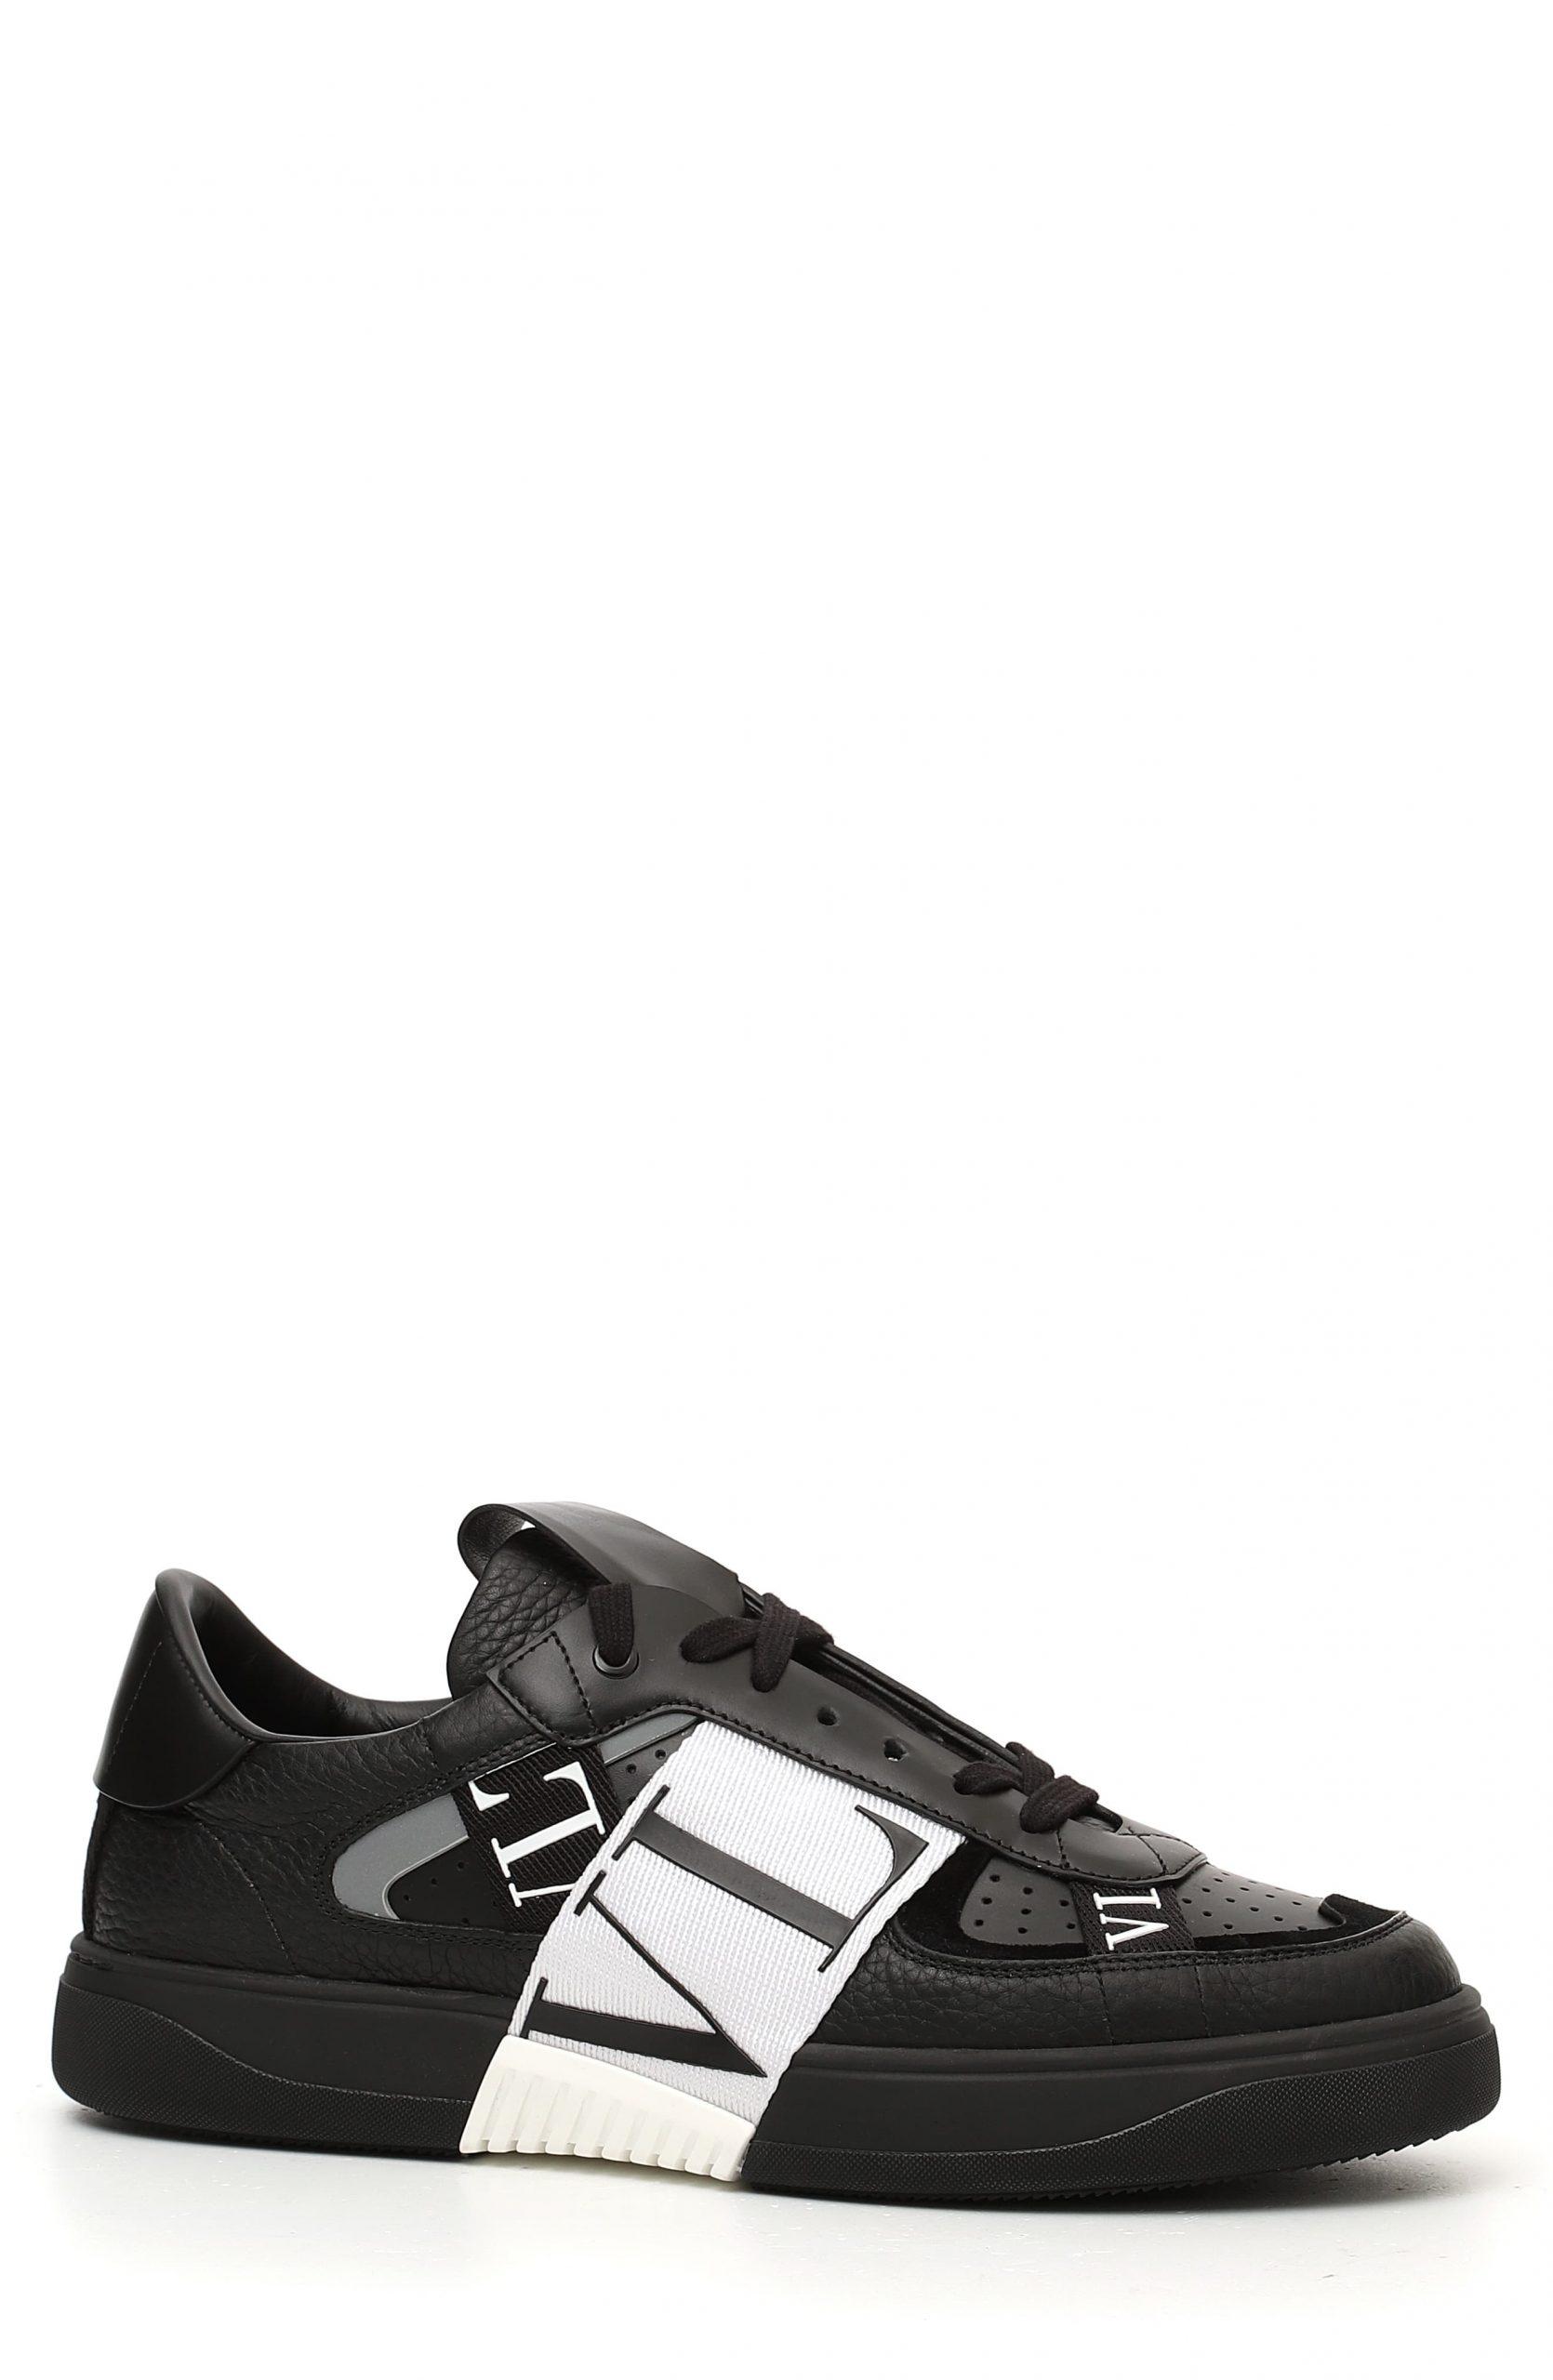 Men's Valentino Garavani Retro Sneaker